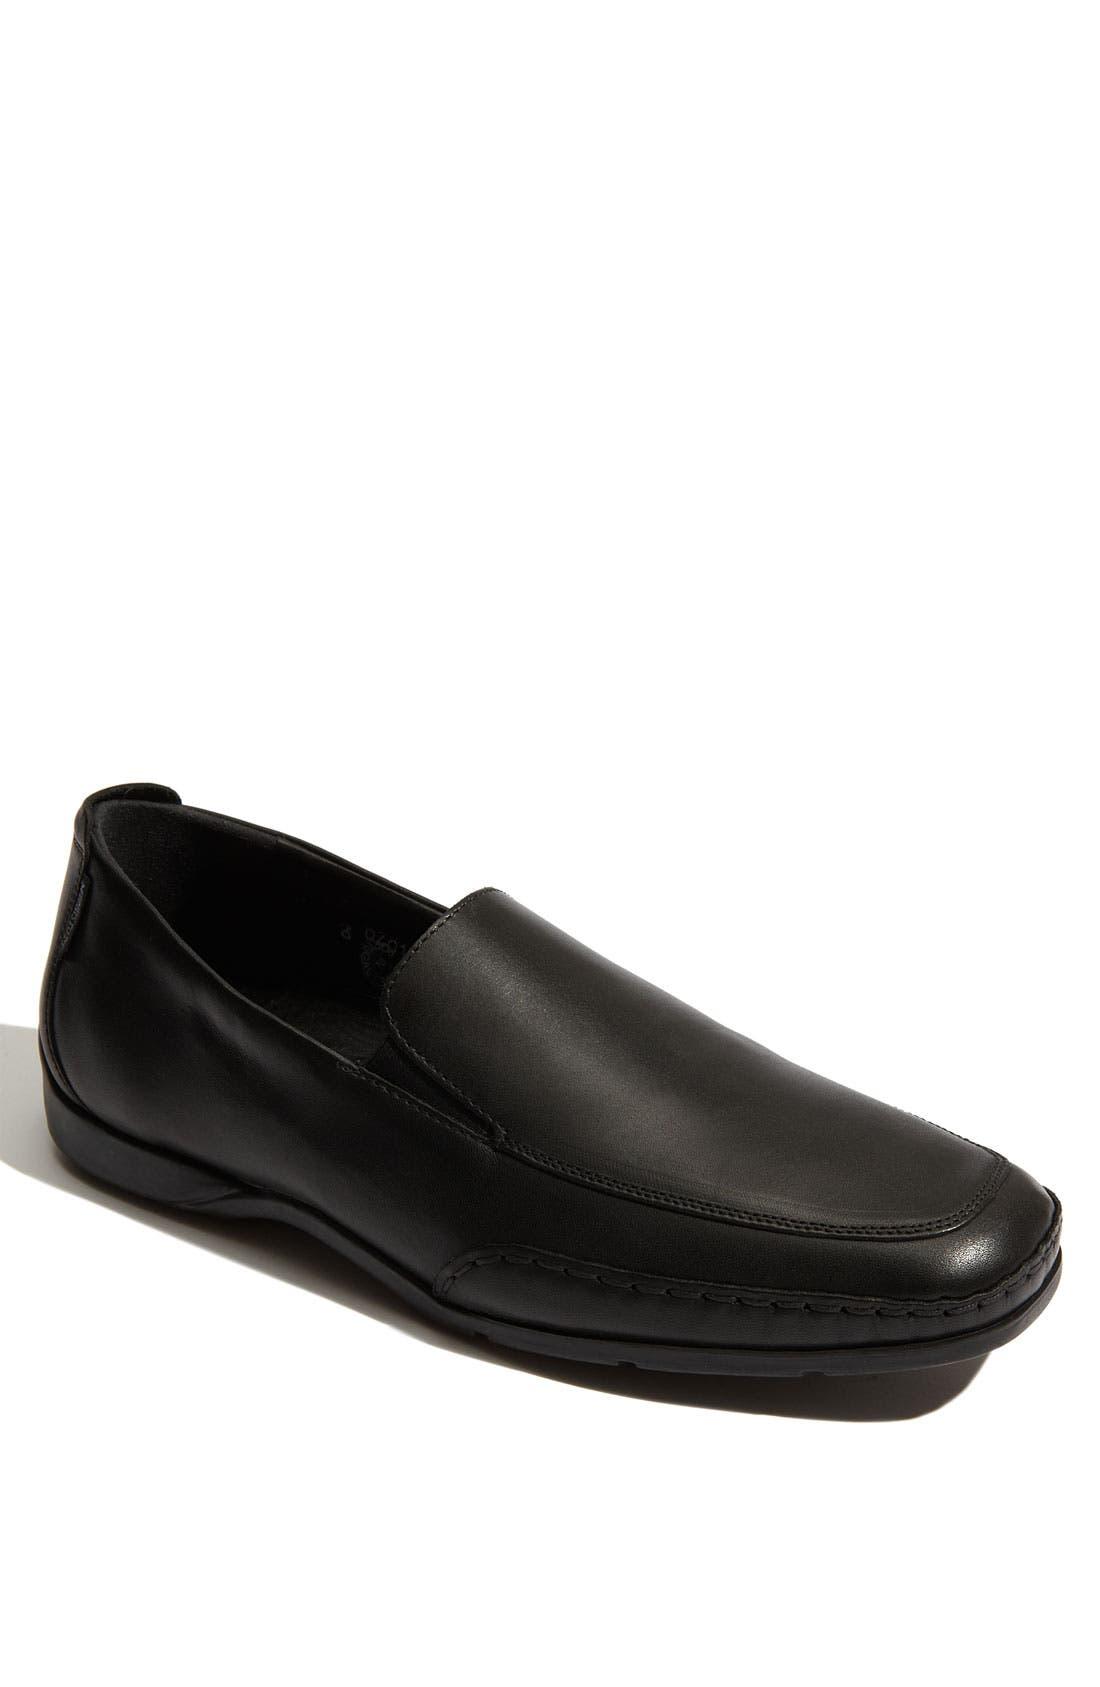 'Edlef' Slip-On,                         Main,                         color, BLACK SMOOTH LEATHER